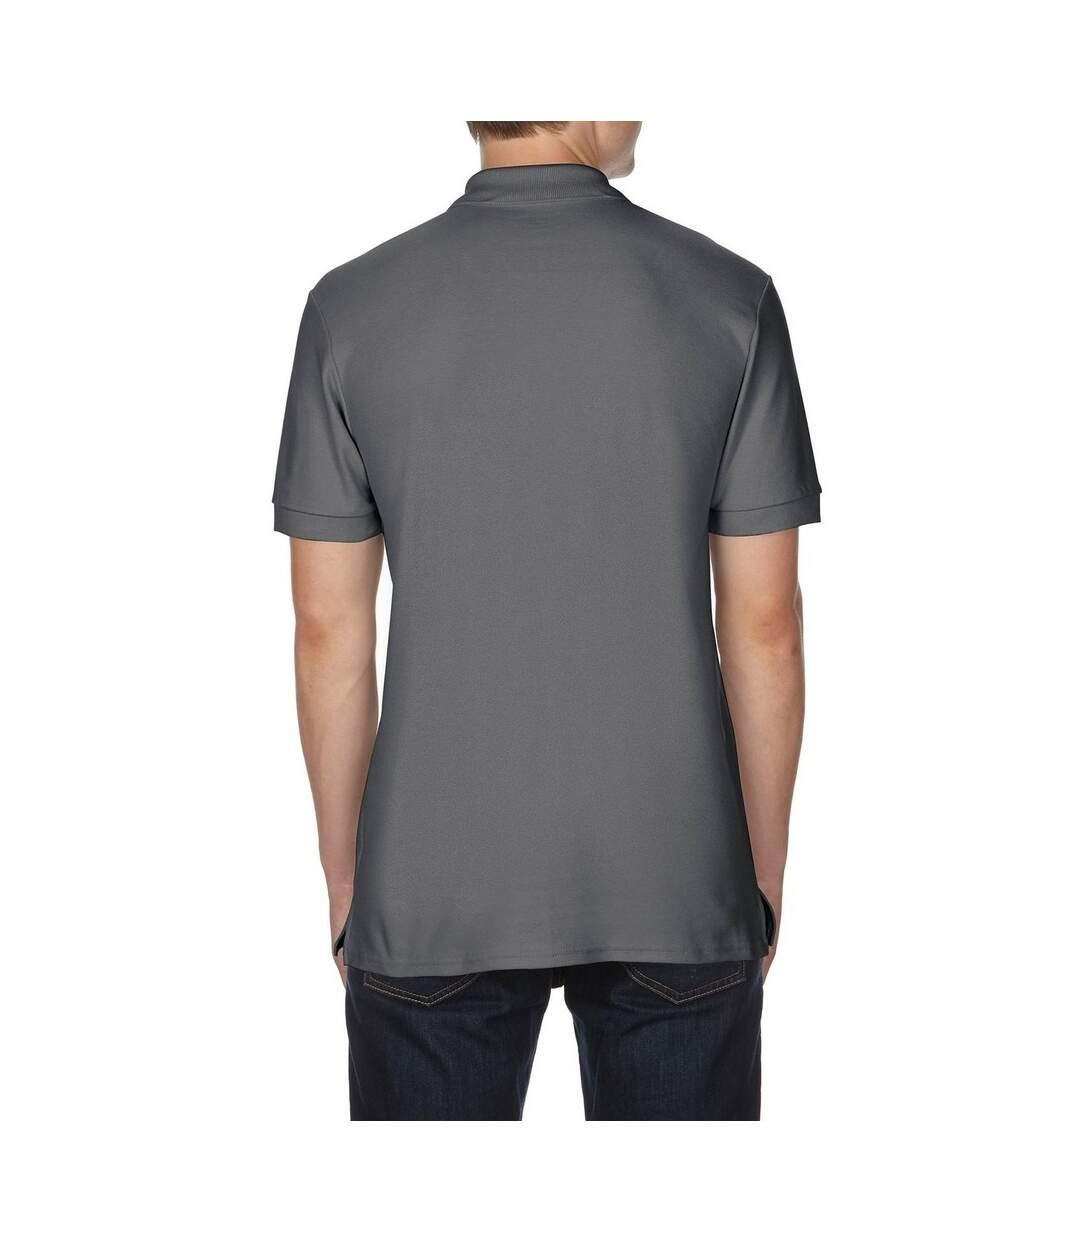 Gildan Mens Premium Cotton Sport Double Pique Polo Shirt (Charcoal) - UTBC3194